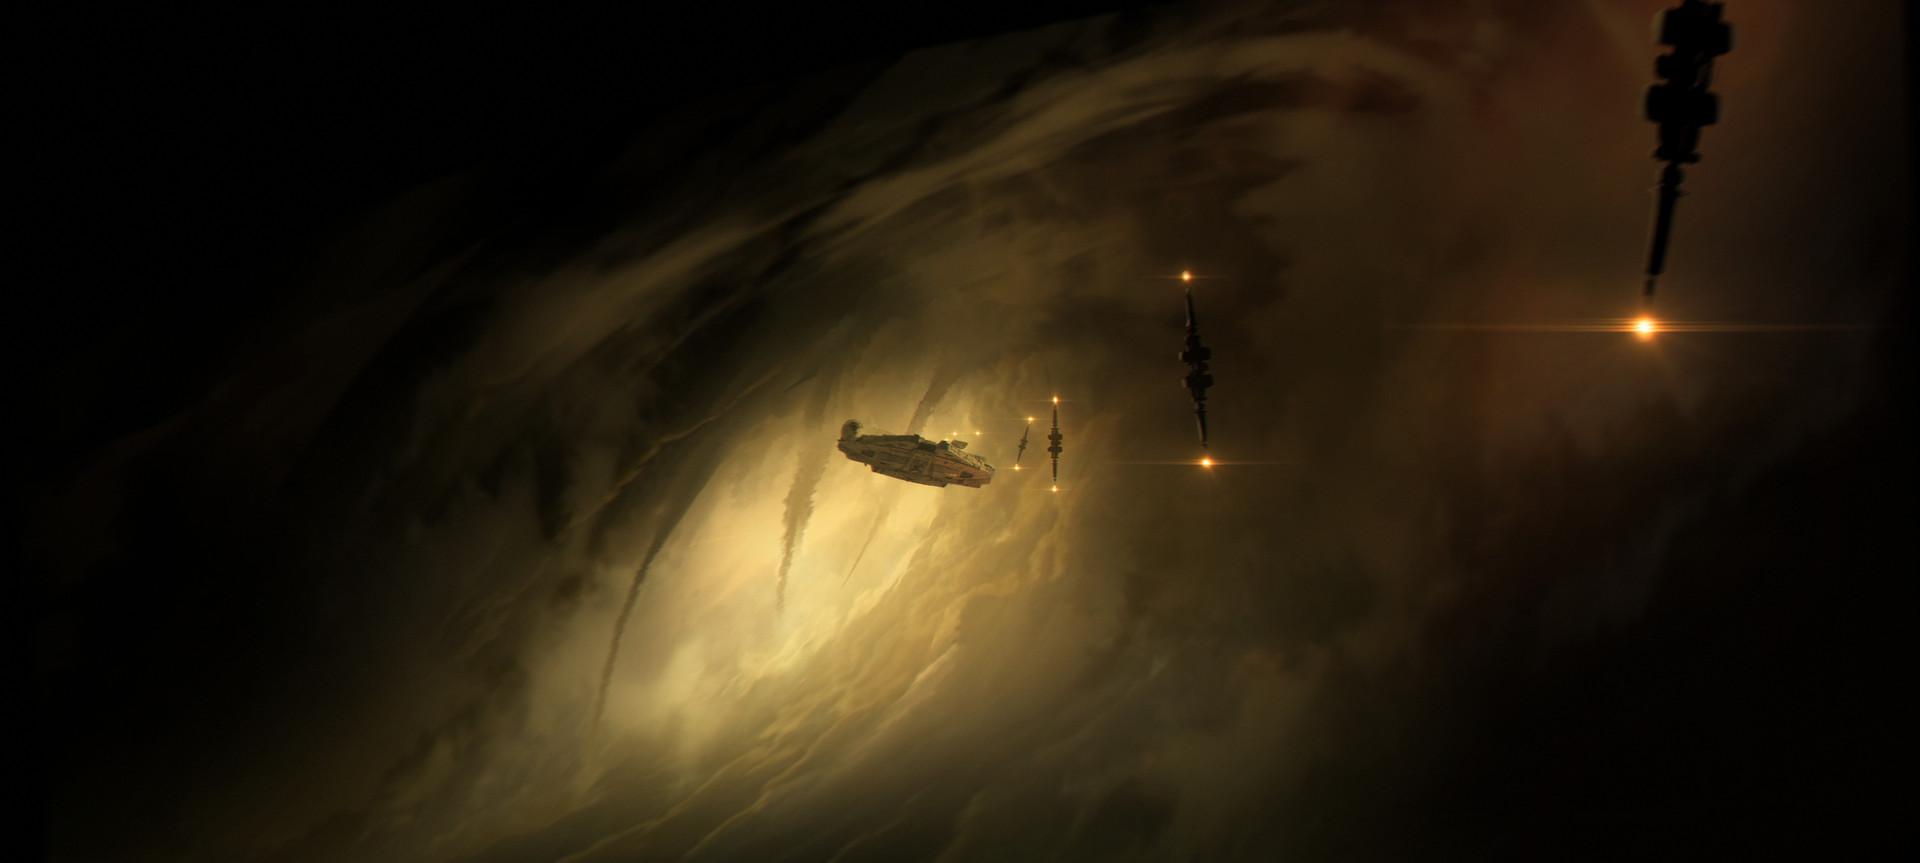 chris-voy-solo-kr-mawtunnel-03.jpg?15332